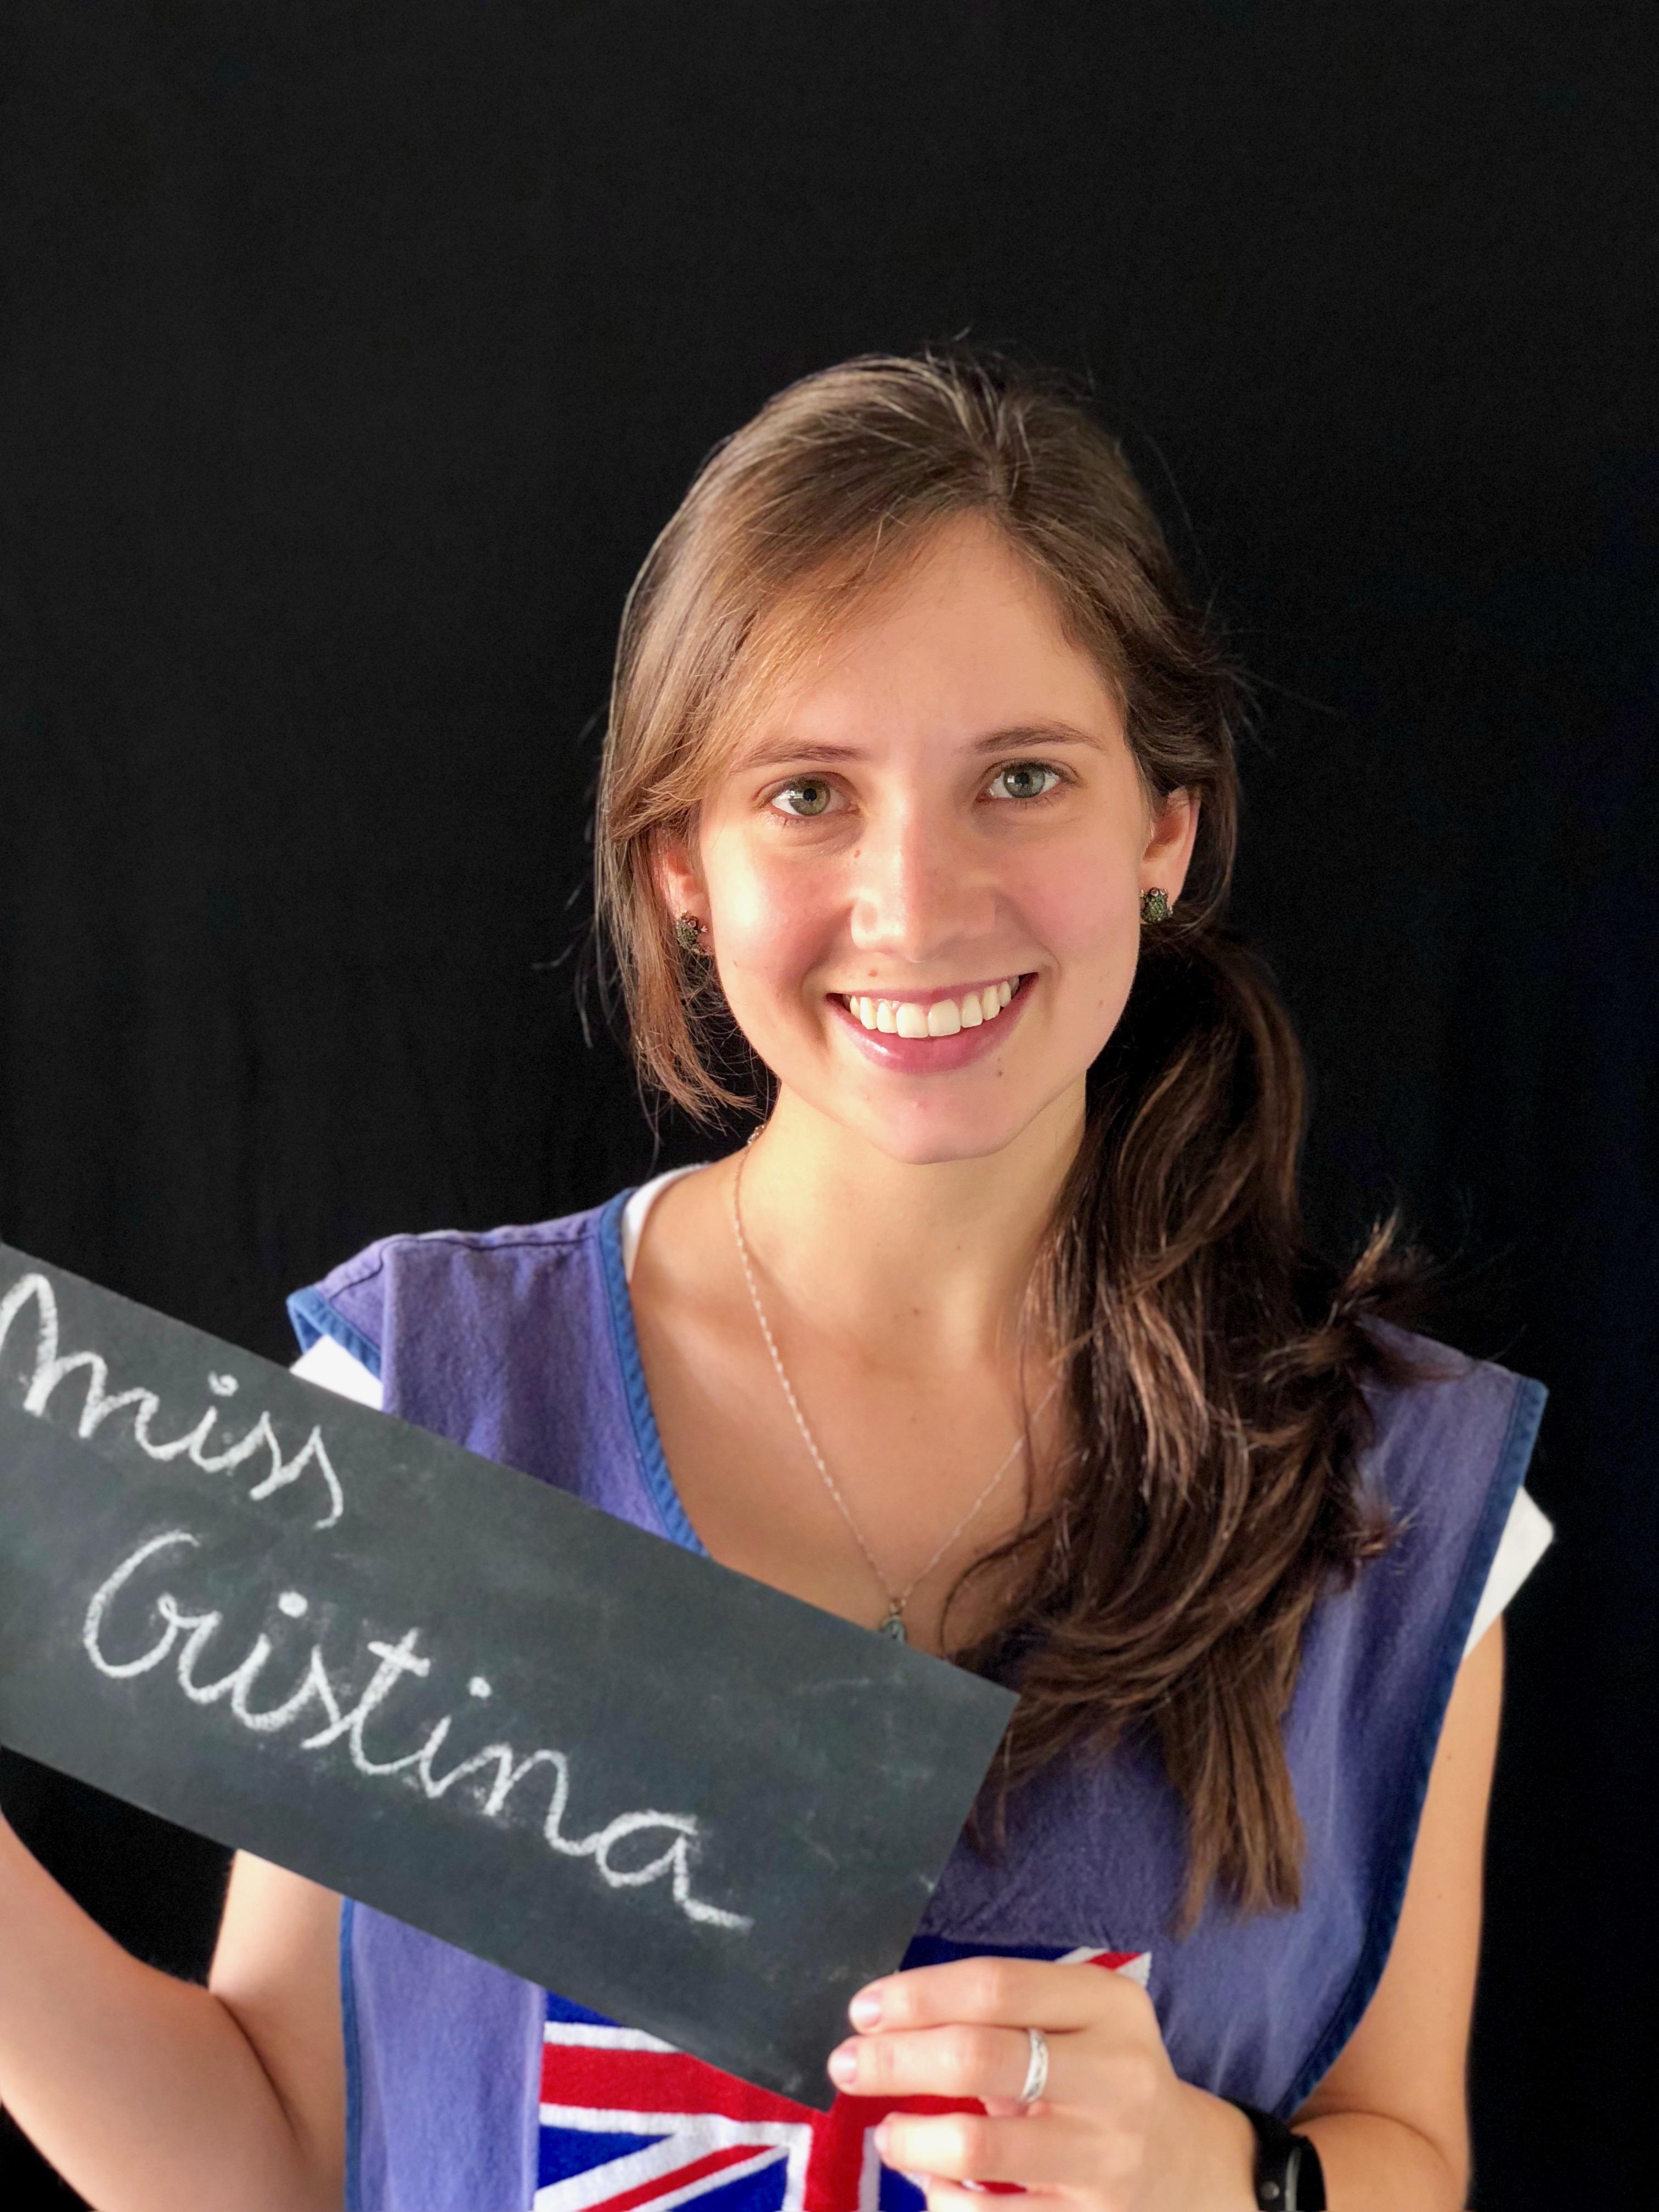 Miss Cristina